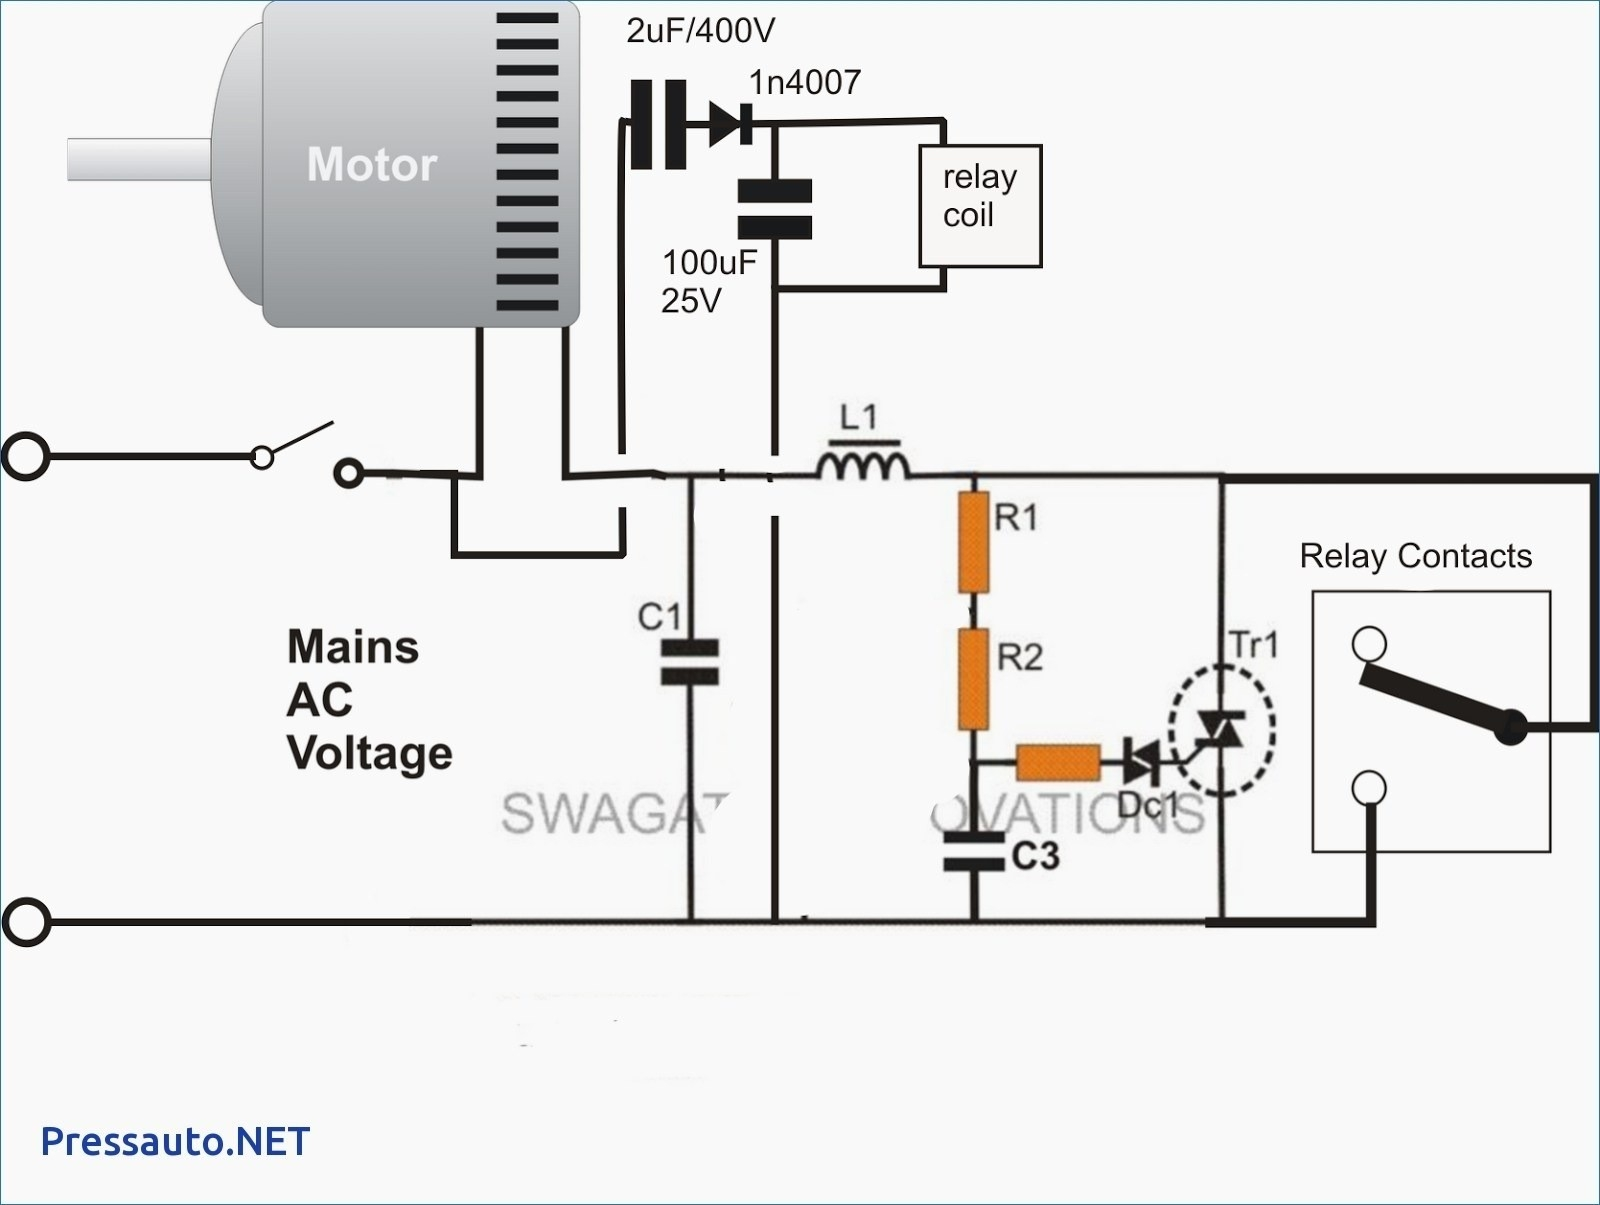 Wiring Diagram Click